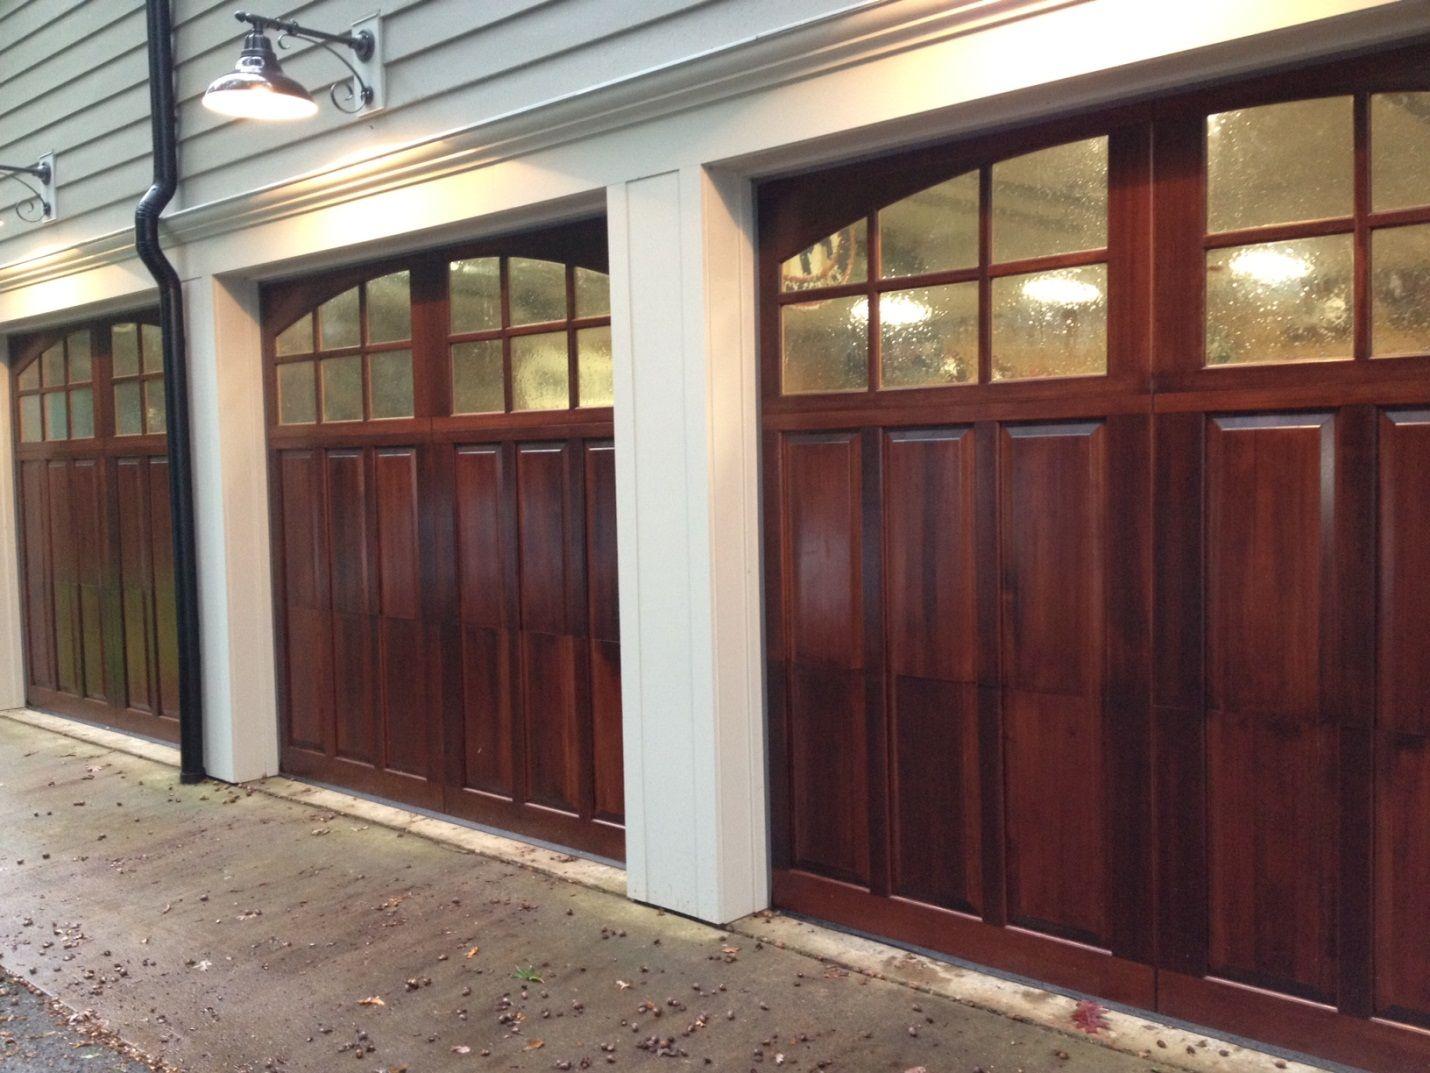 Best 25 garage door sizes ideas on pinterest best garage doors best 25 garage door sizes ideas on pinterest best garage doors diy garage kits and garage doors rubansaba